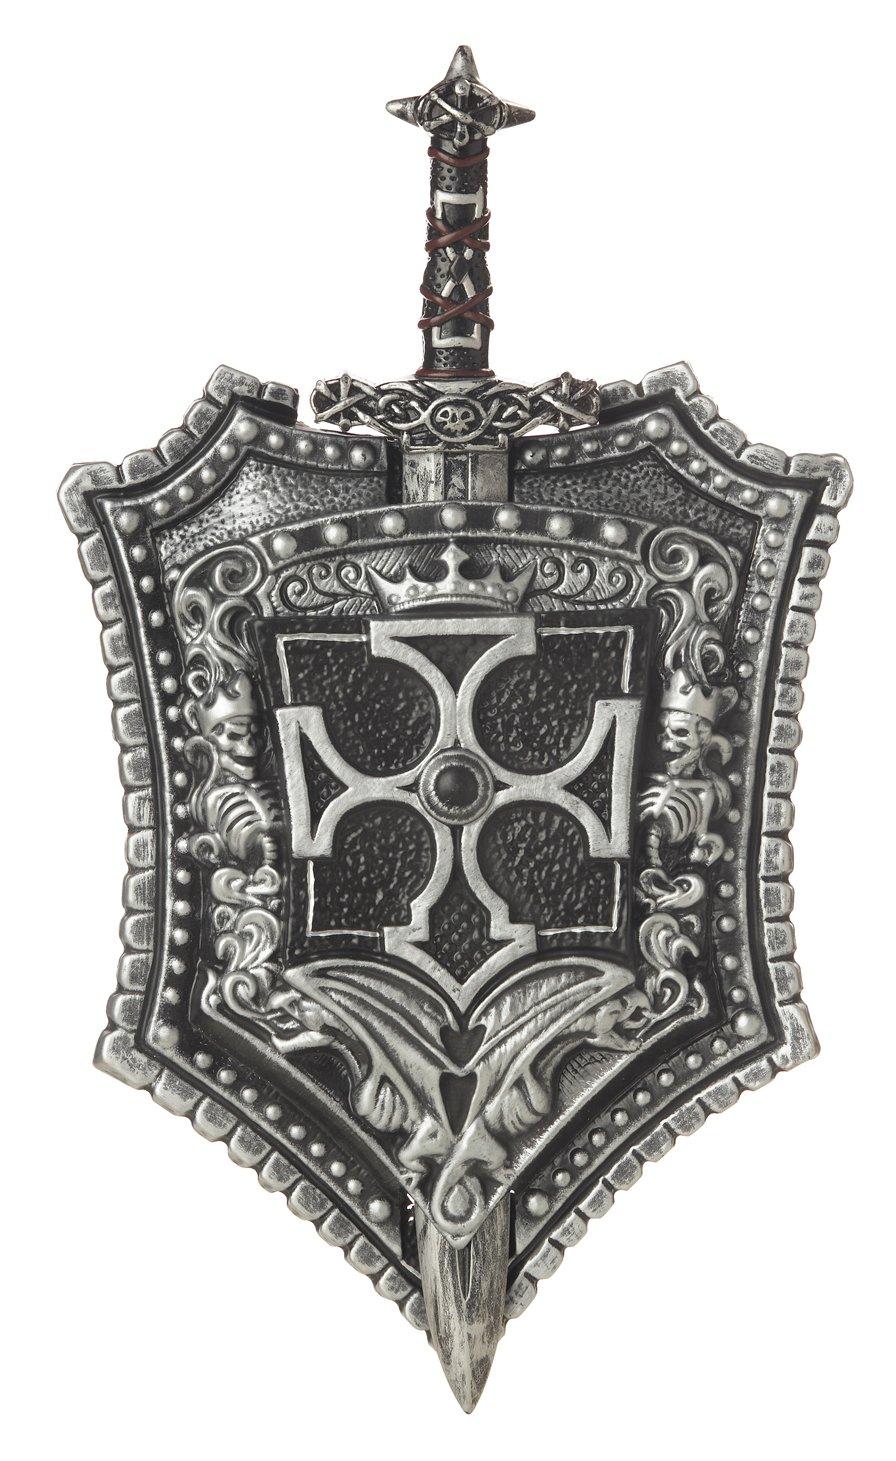 California Costumes Crusader Sword & Shield Costume Accessory Black/Silver One Size Costume 60318-Black/Silver-One Size